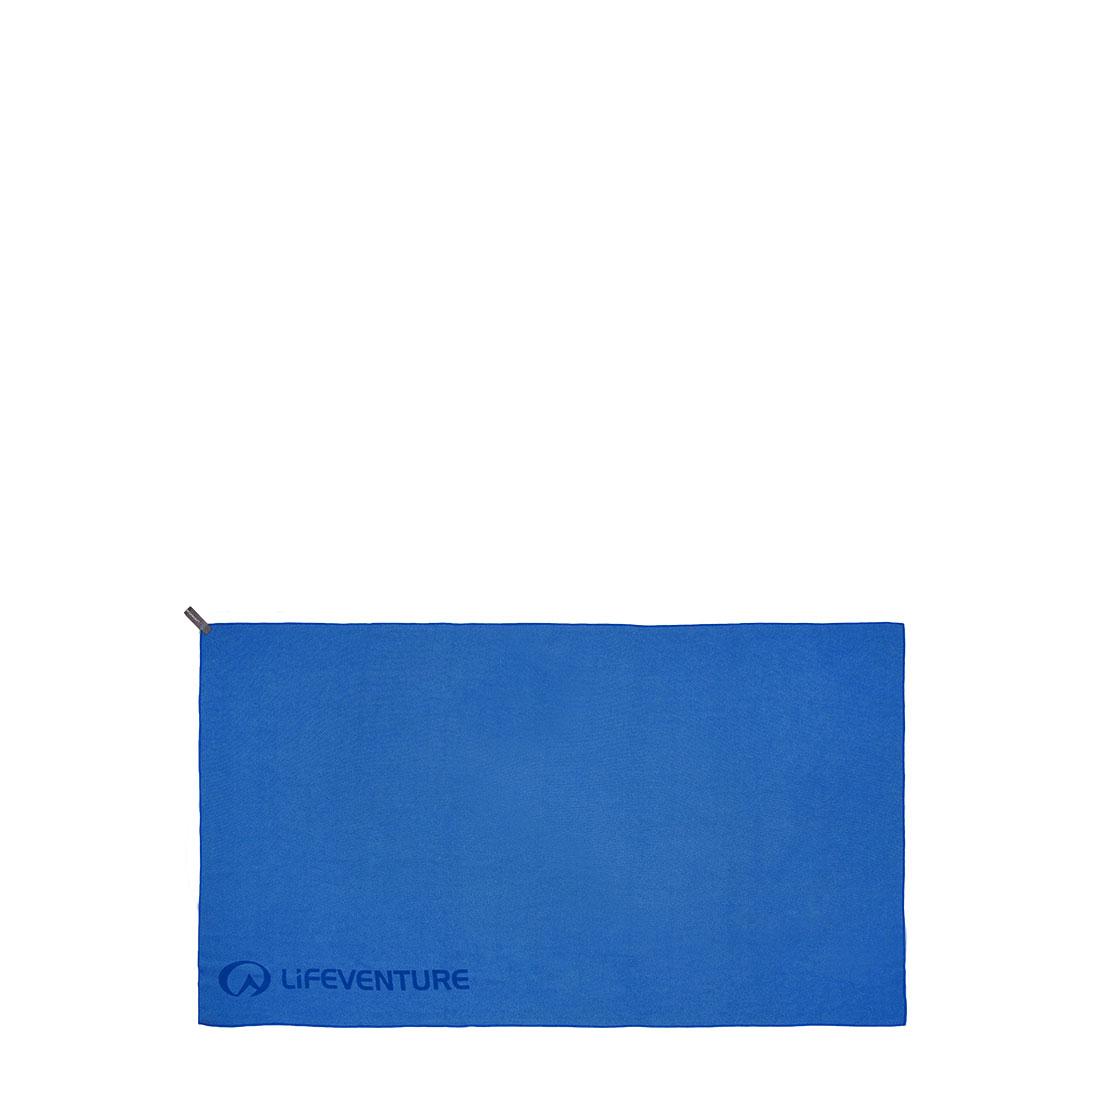 Microfibre Travel Towel (large)